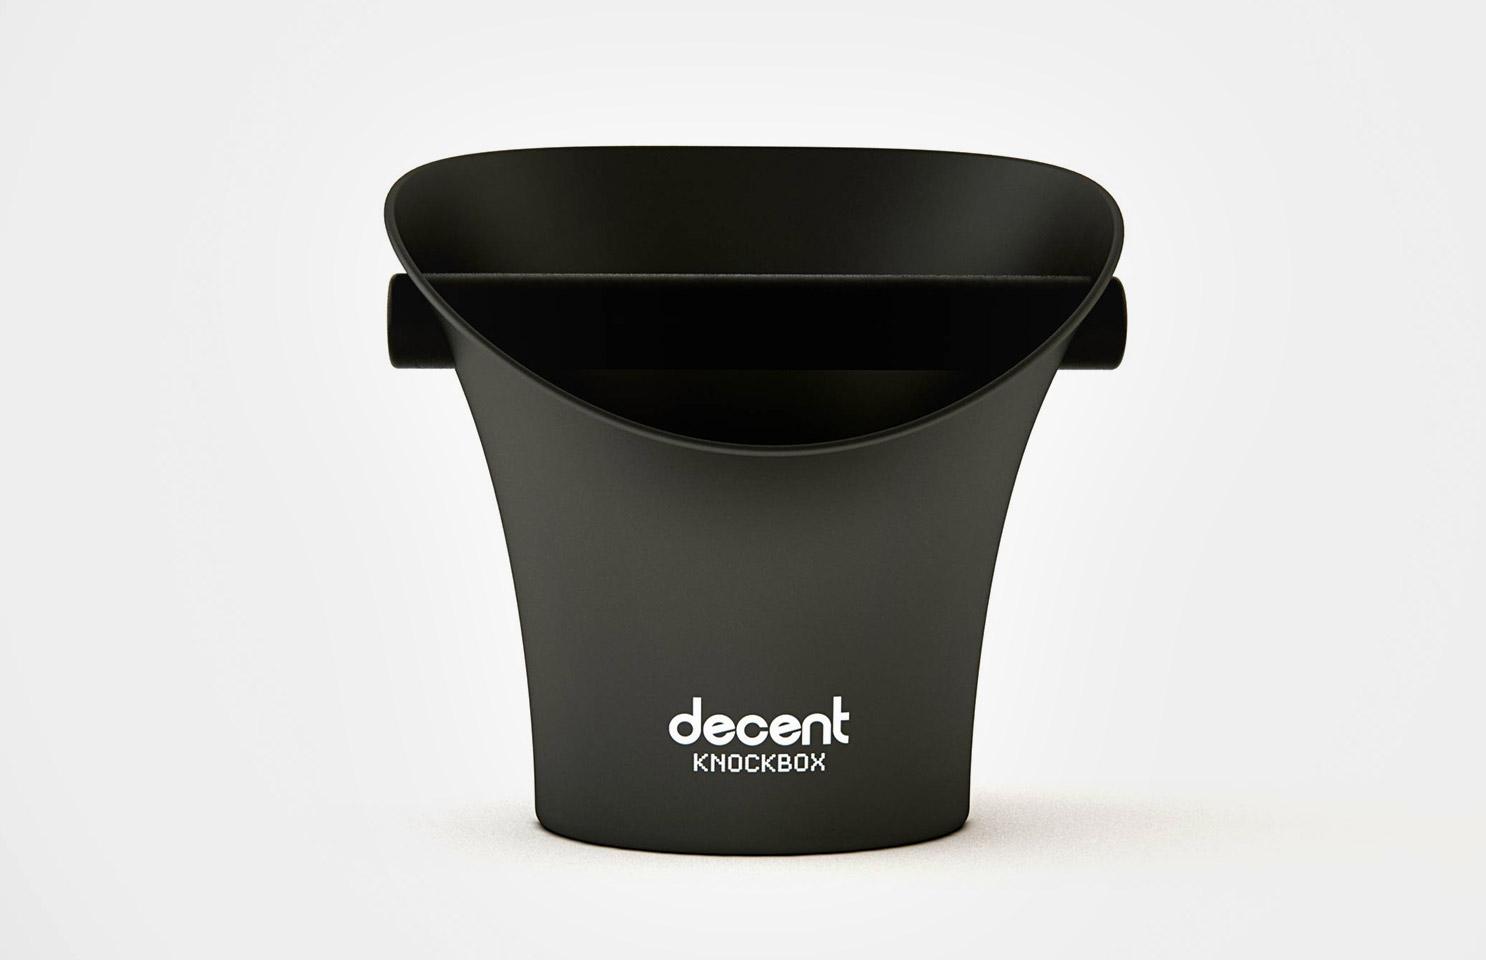 acheter une machine expresso decent espresso. Black Bedroom Furniture Sets. Home Design Ideas